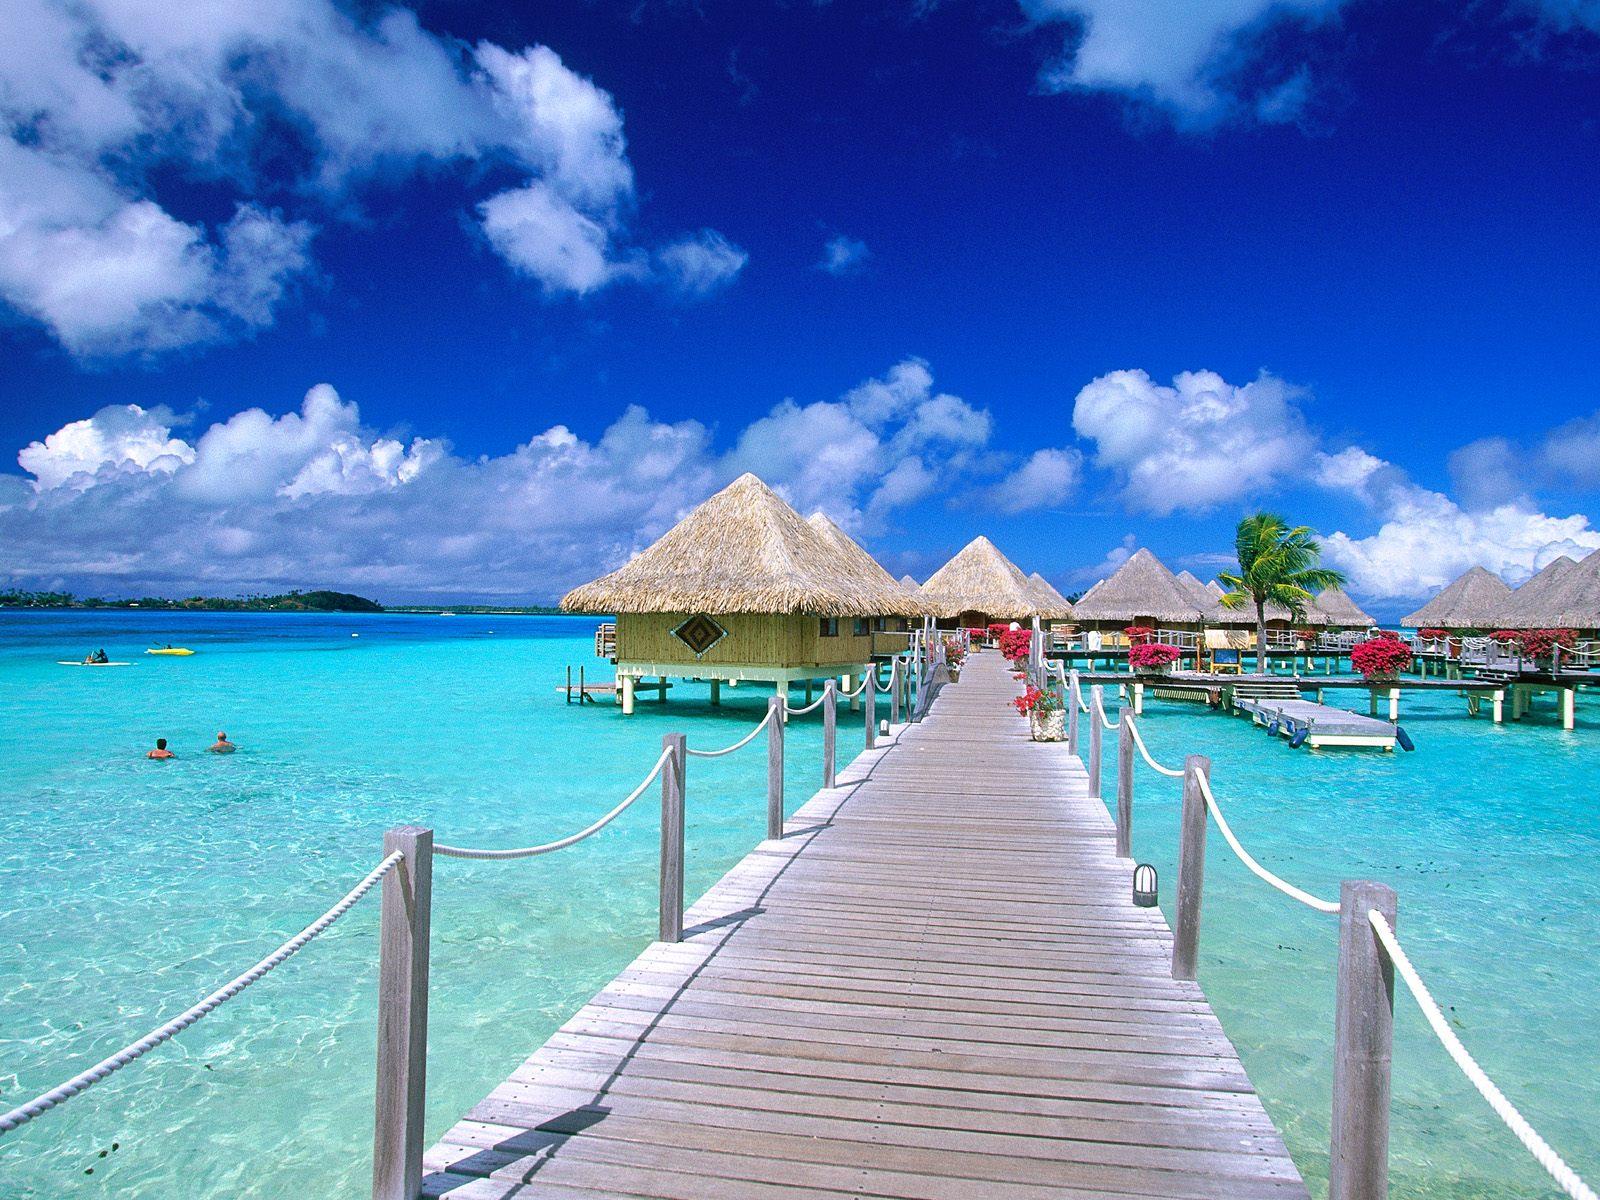 tropical island beach scenery holiday village desktop wallpaper 1600x1200